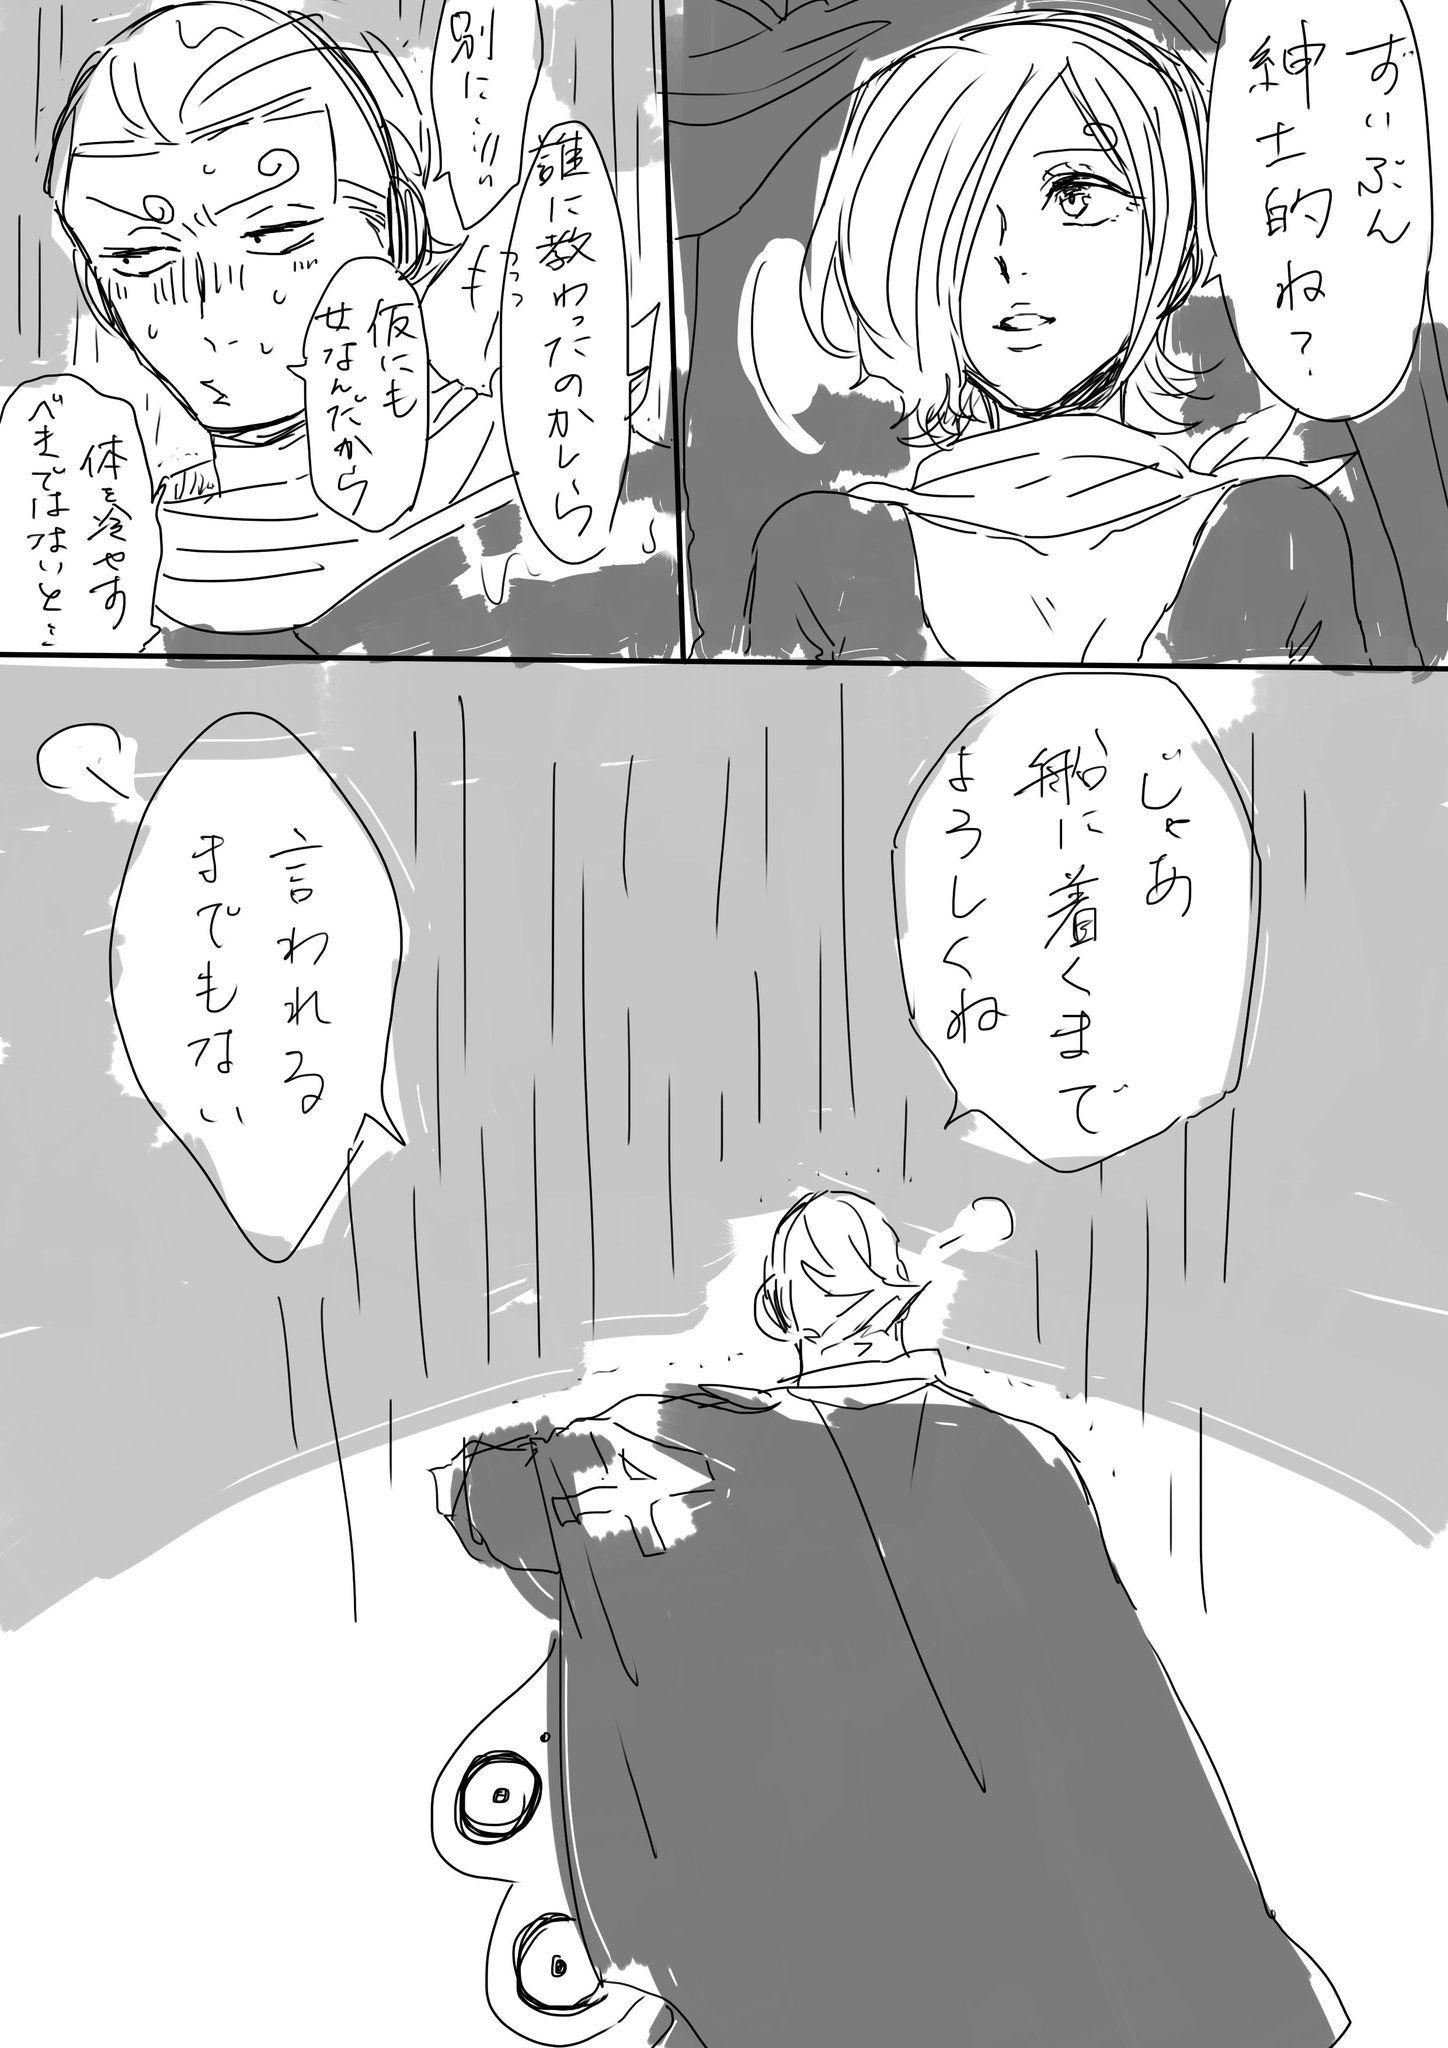 twitter ゲーム アニメ アニメ ワンピース アニメ